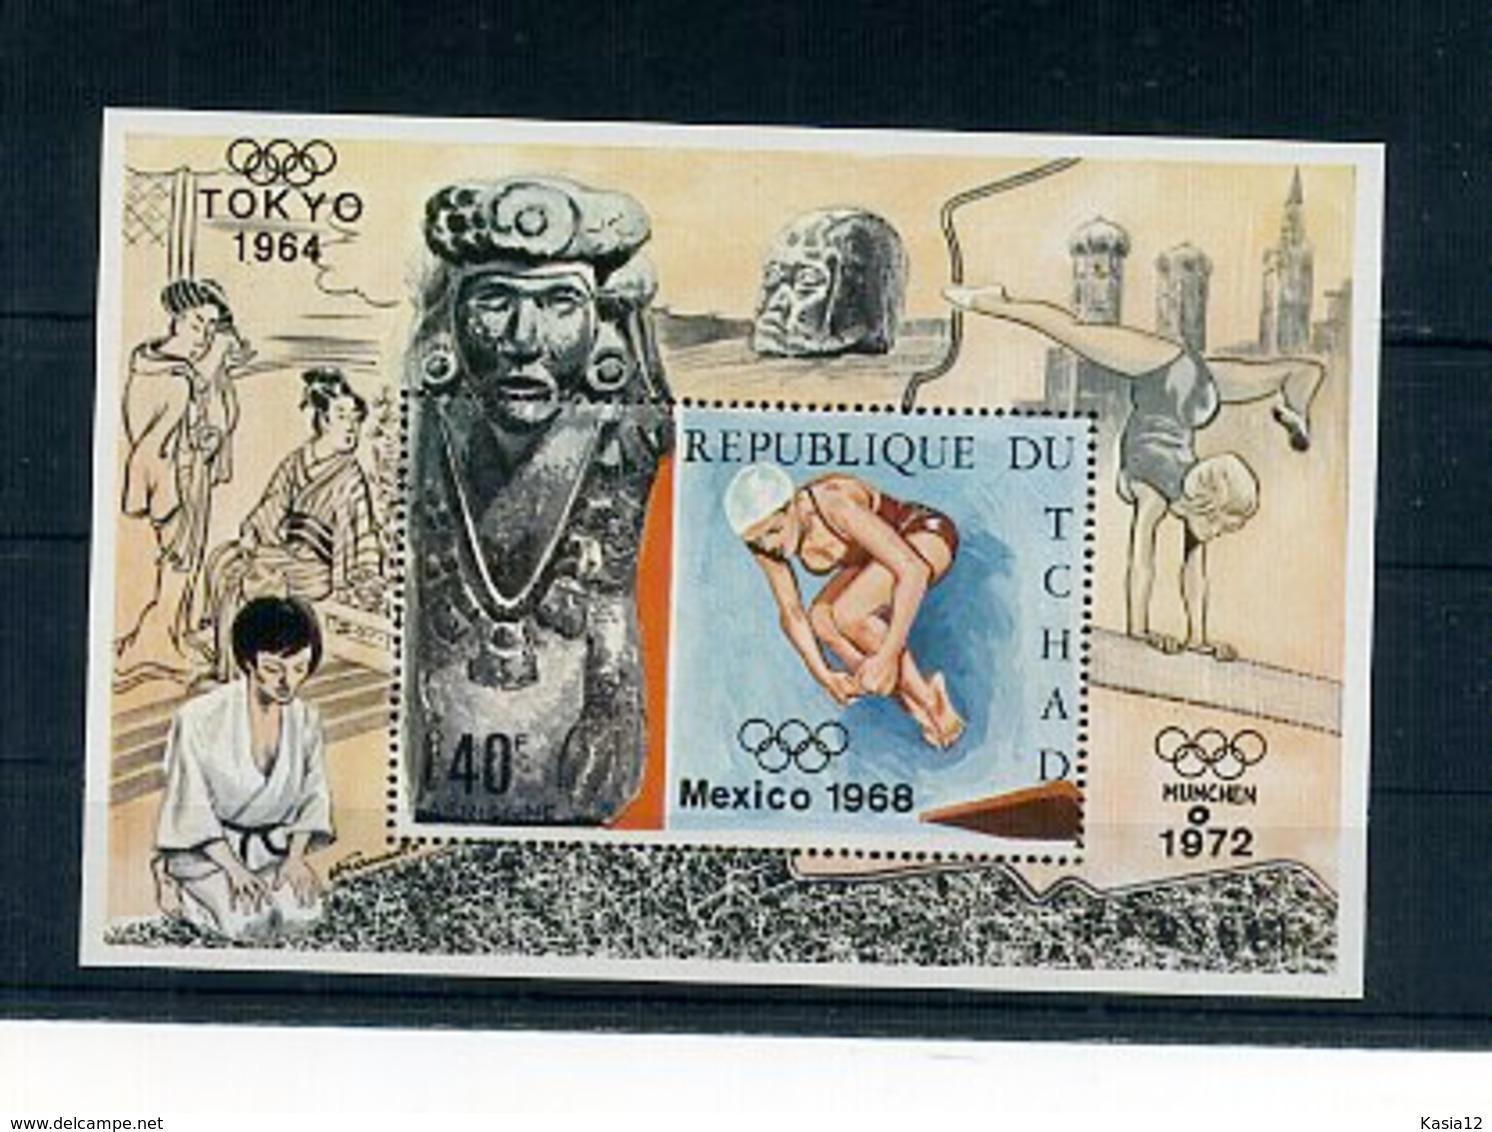 A33178)Olympia 68: Tschad Bl 11 A** - Zomer 1968: Mexico-City